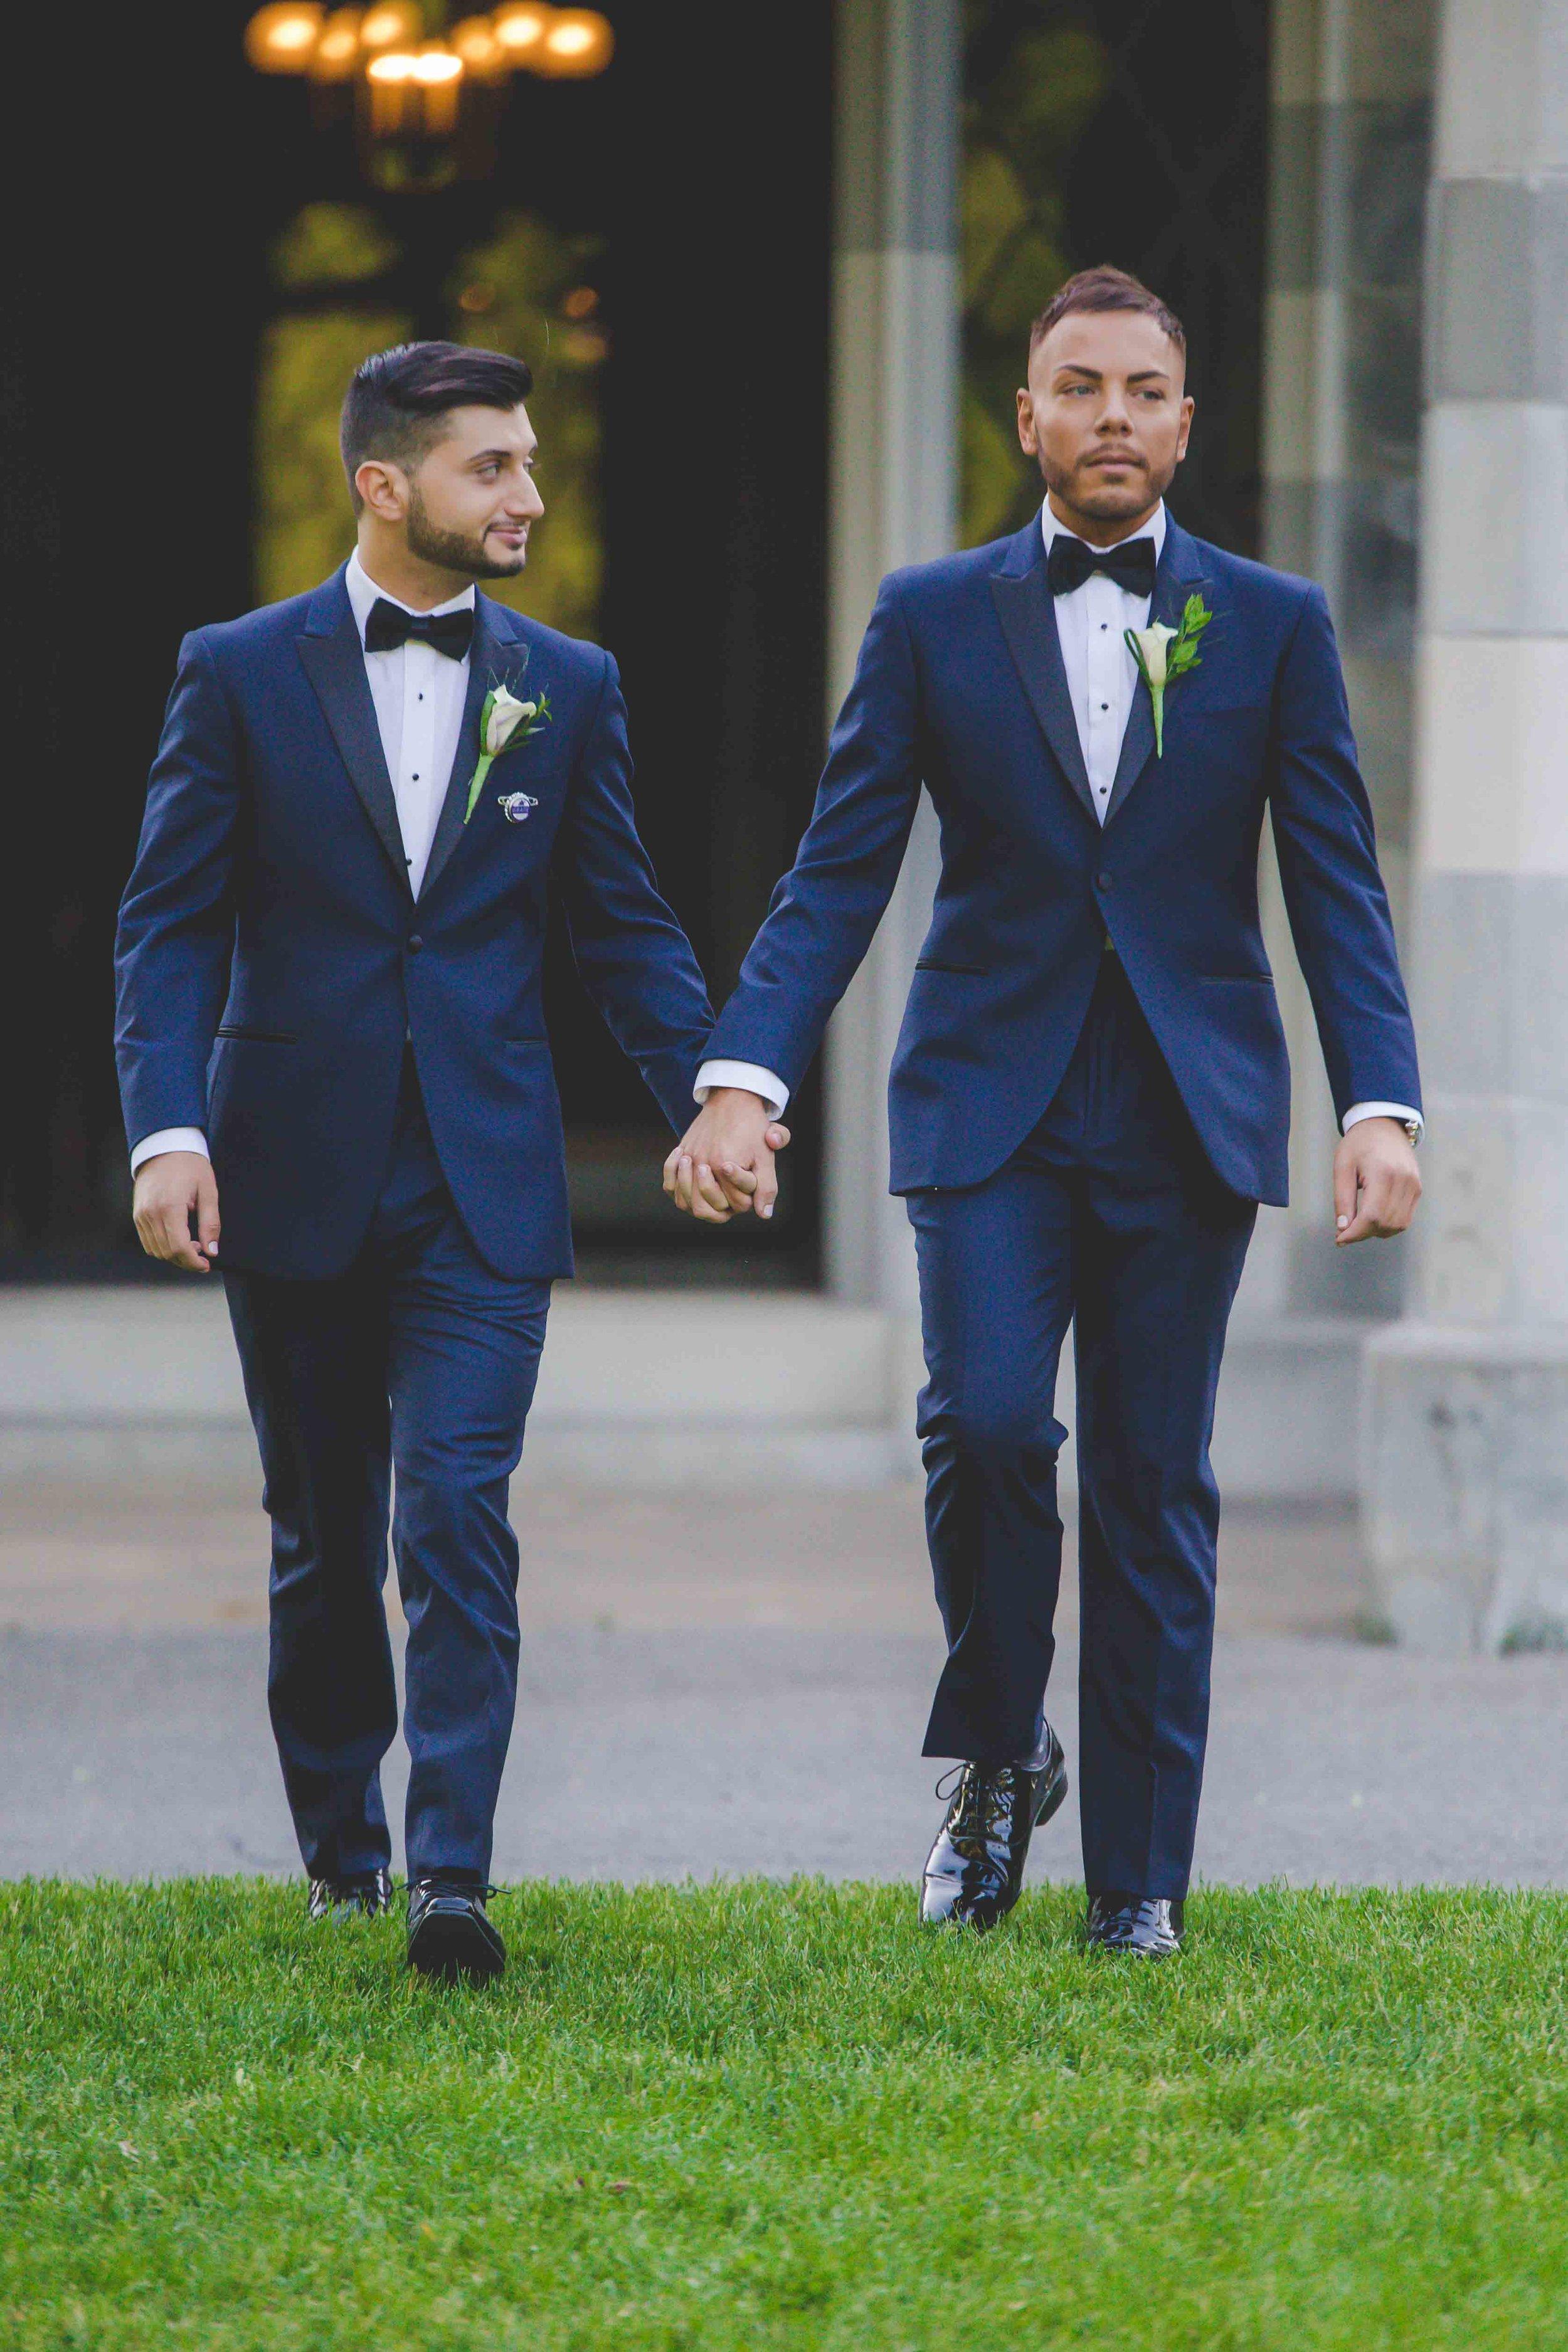 lyndhurst-mansion-amazing-gay-wedding-29.jpg